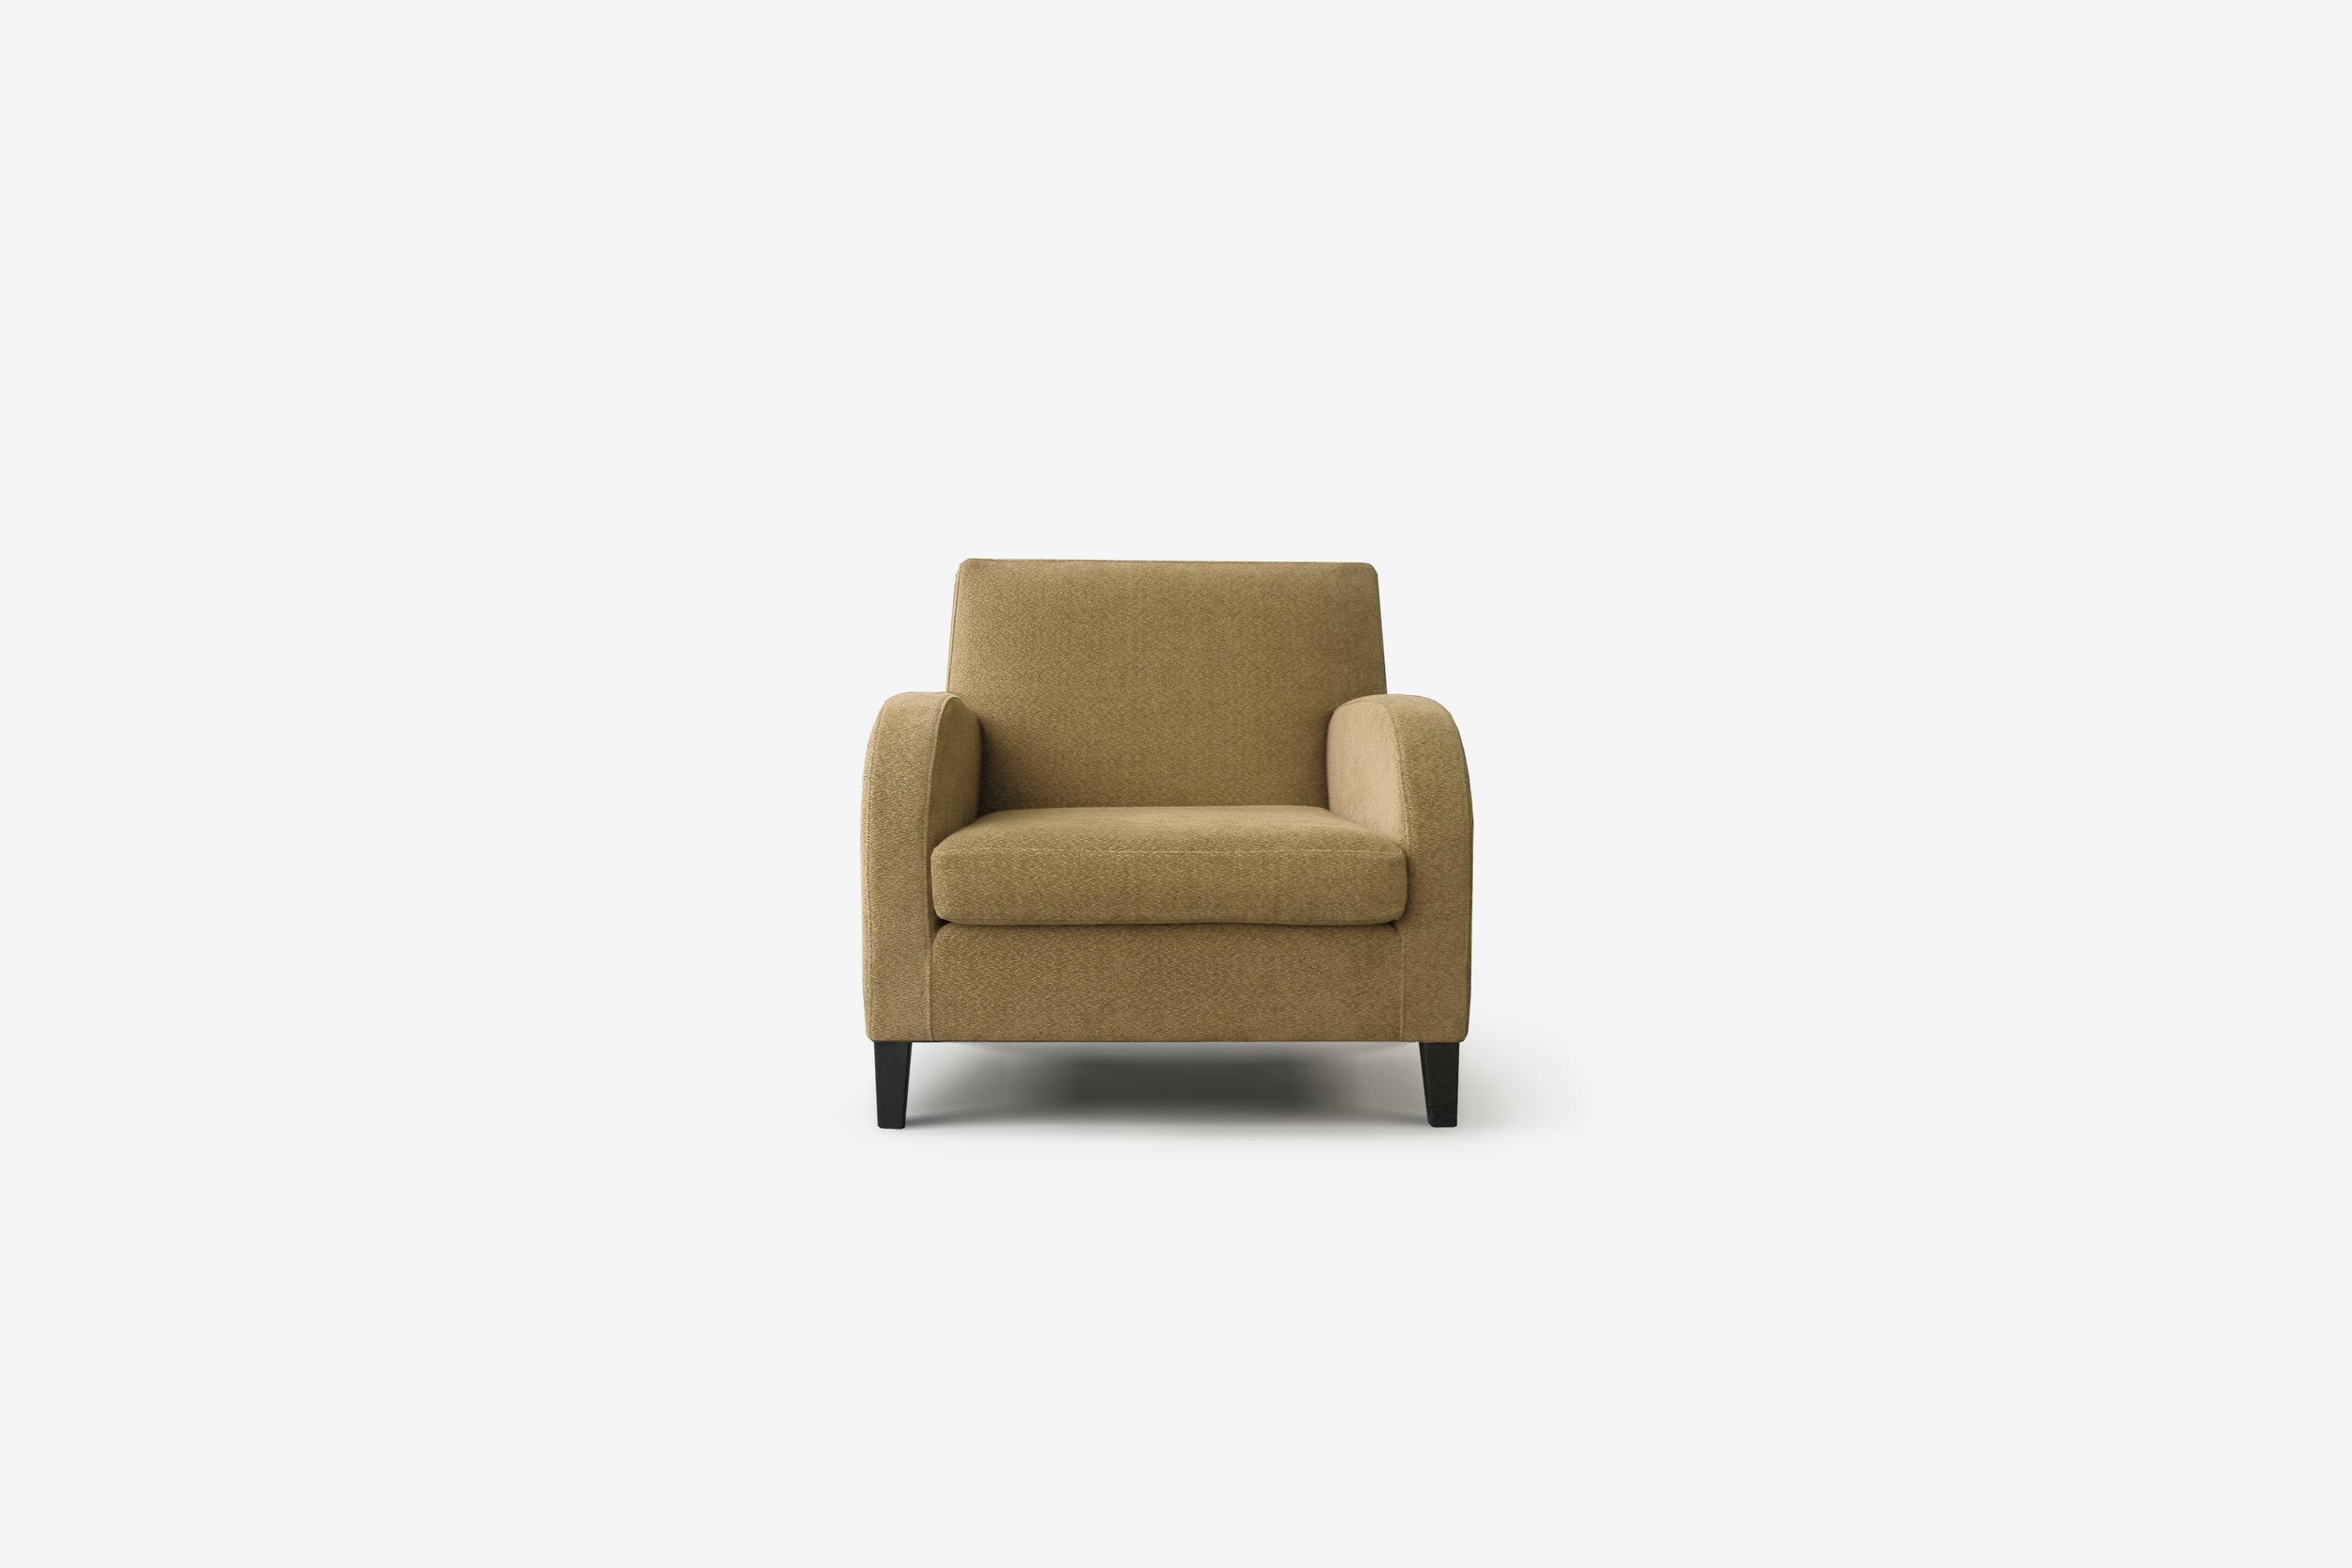 Dexter Chair by Belle